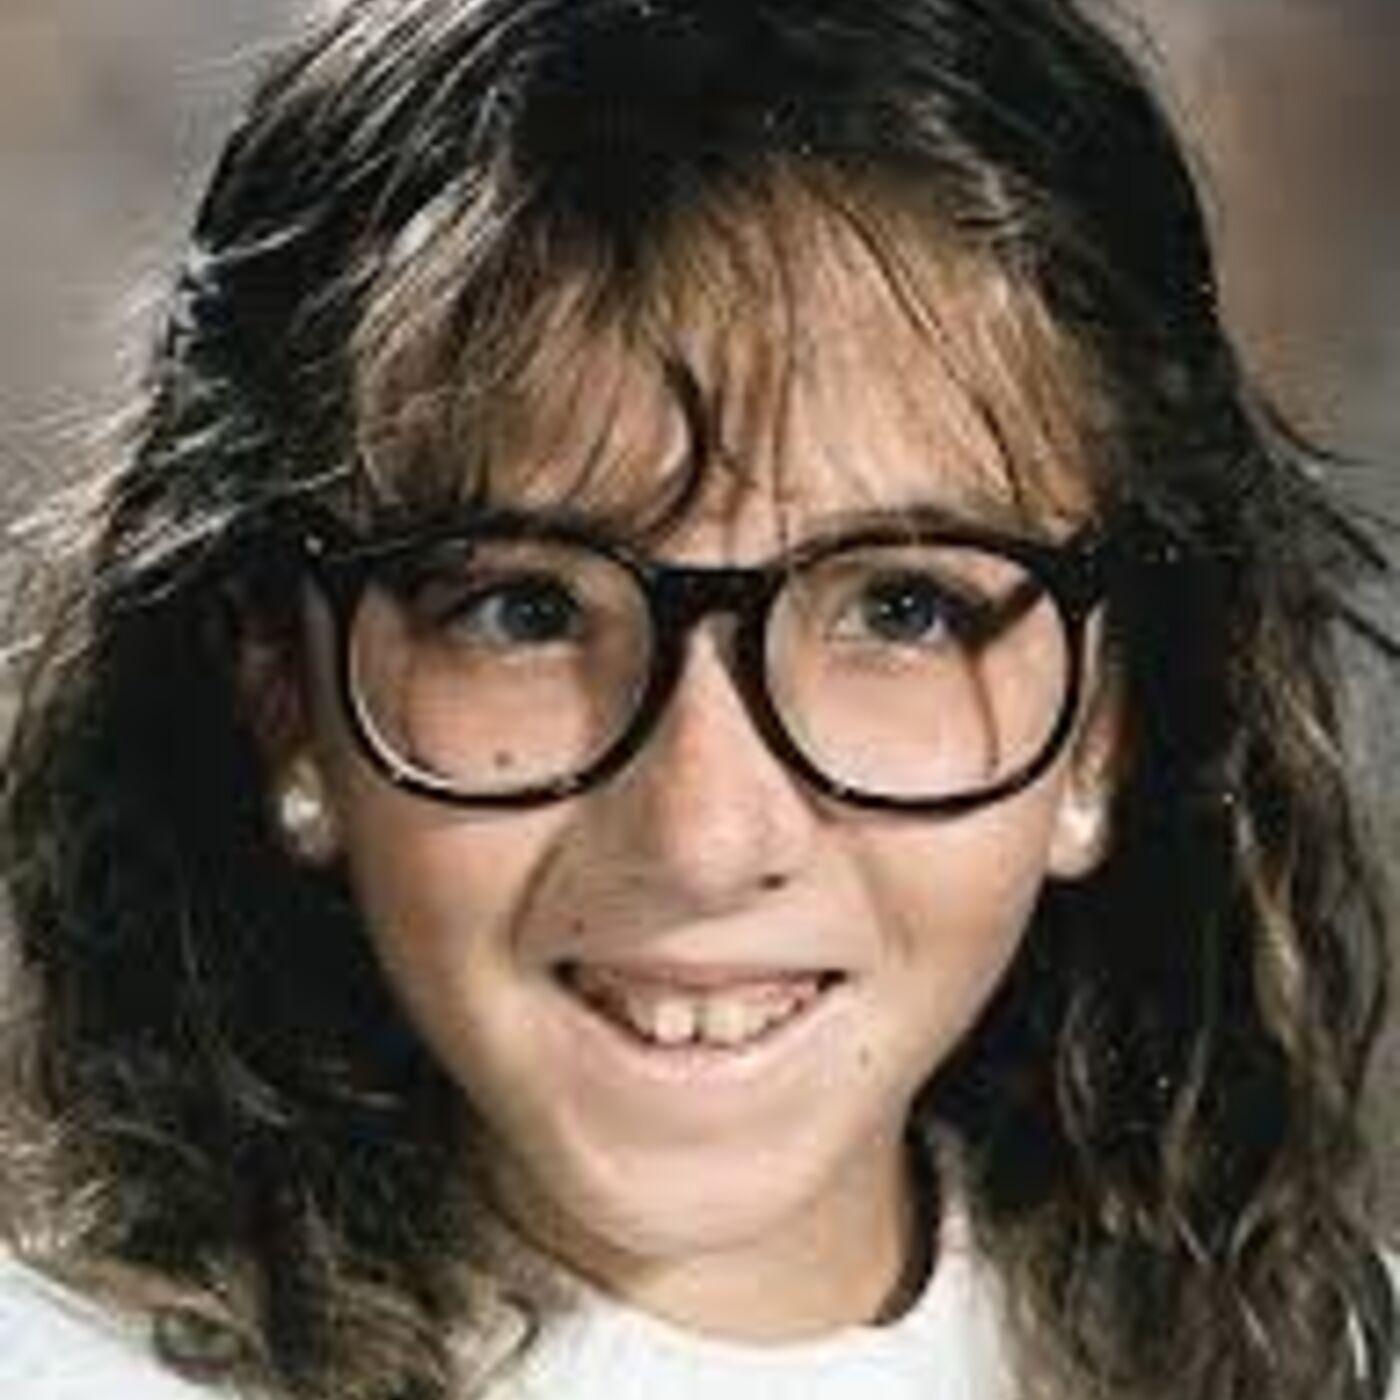 The Murder of Heather Dawn Church